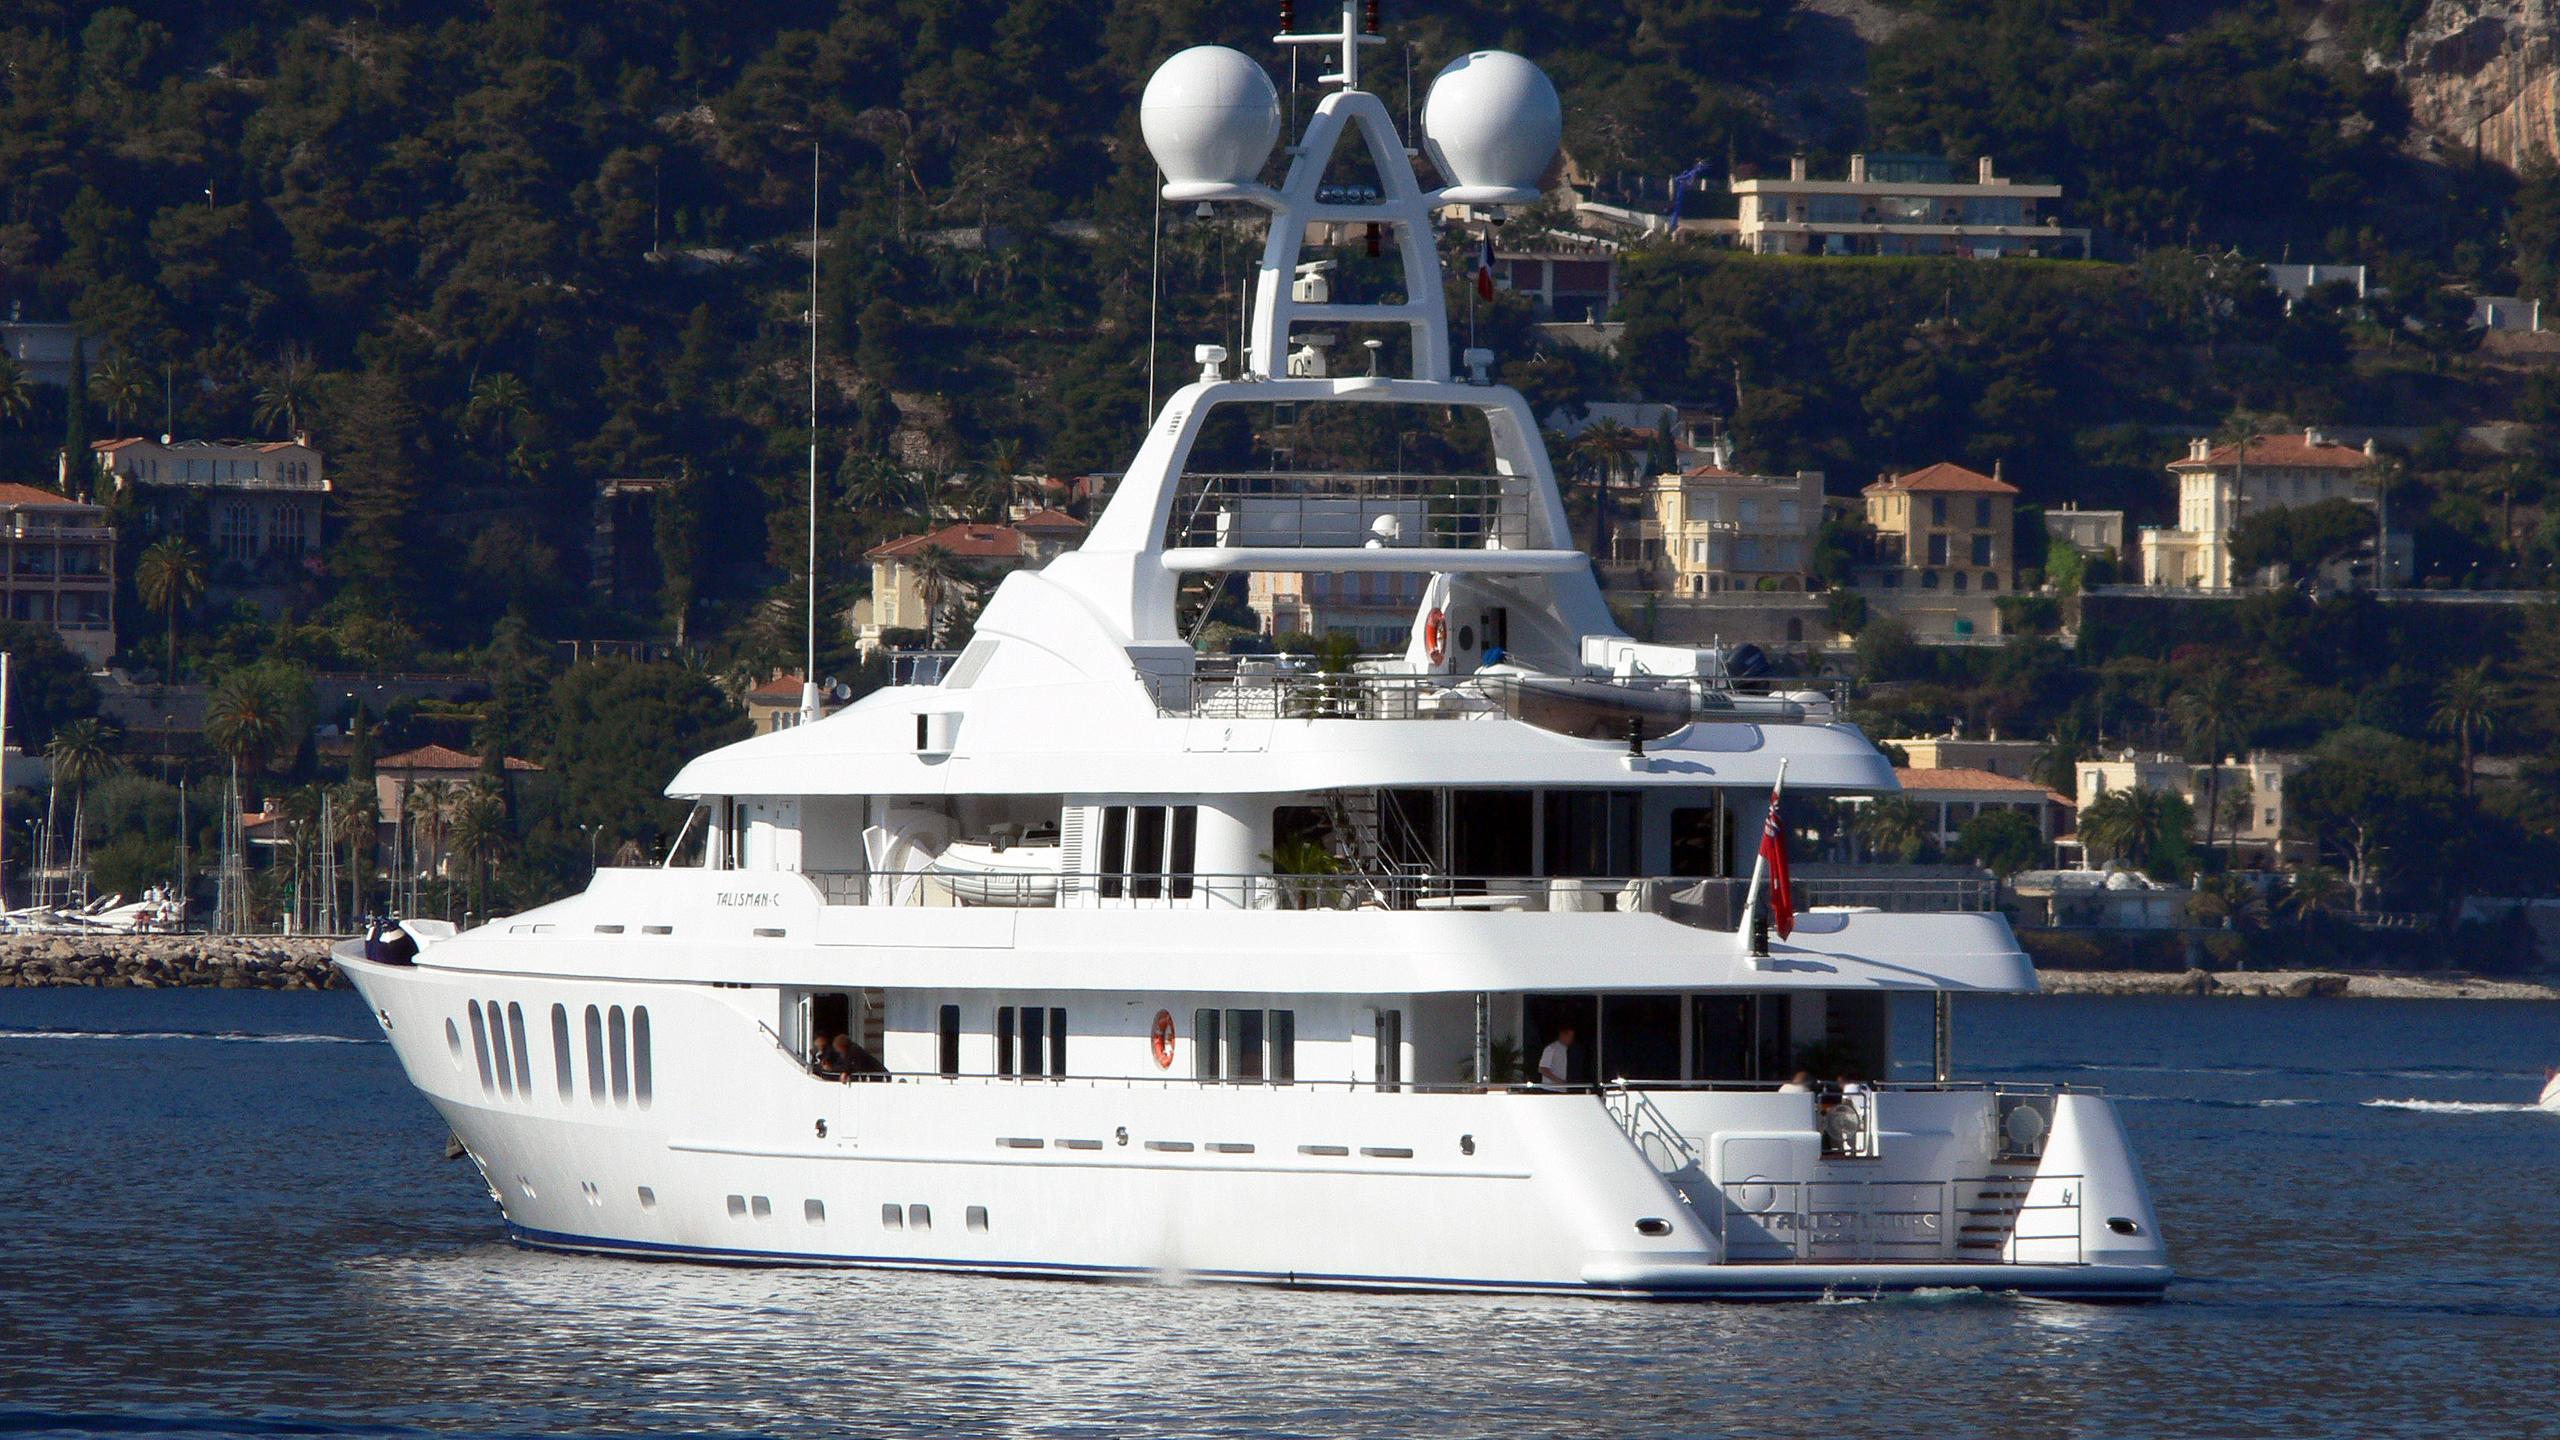 talisman-maiton-motor-yacht-turquoise-2006-54m-stern